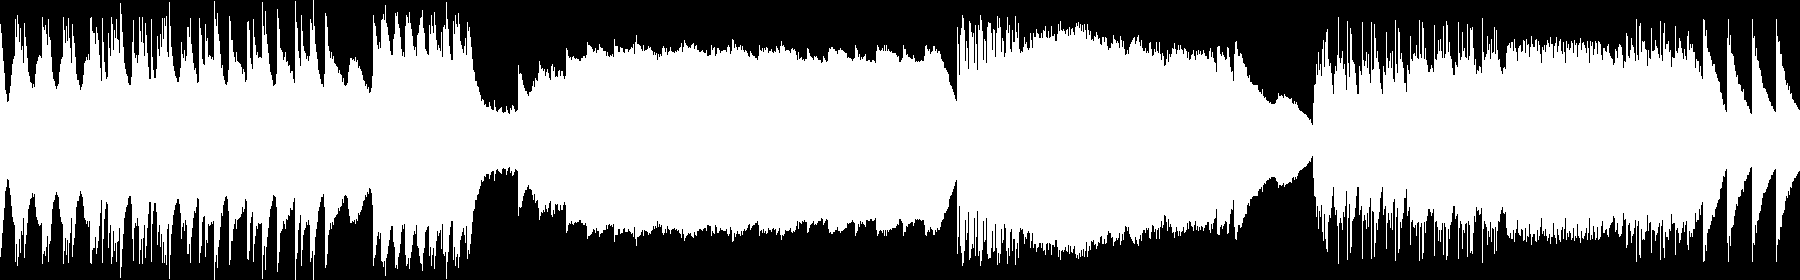 Ritual Kontakts audio waveform